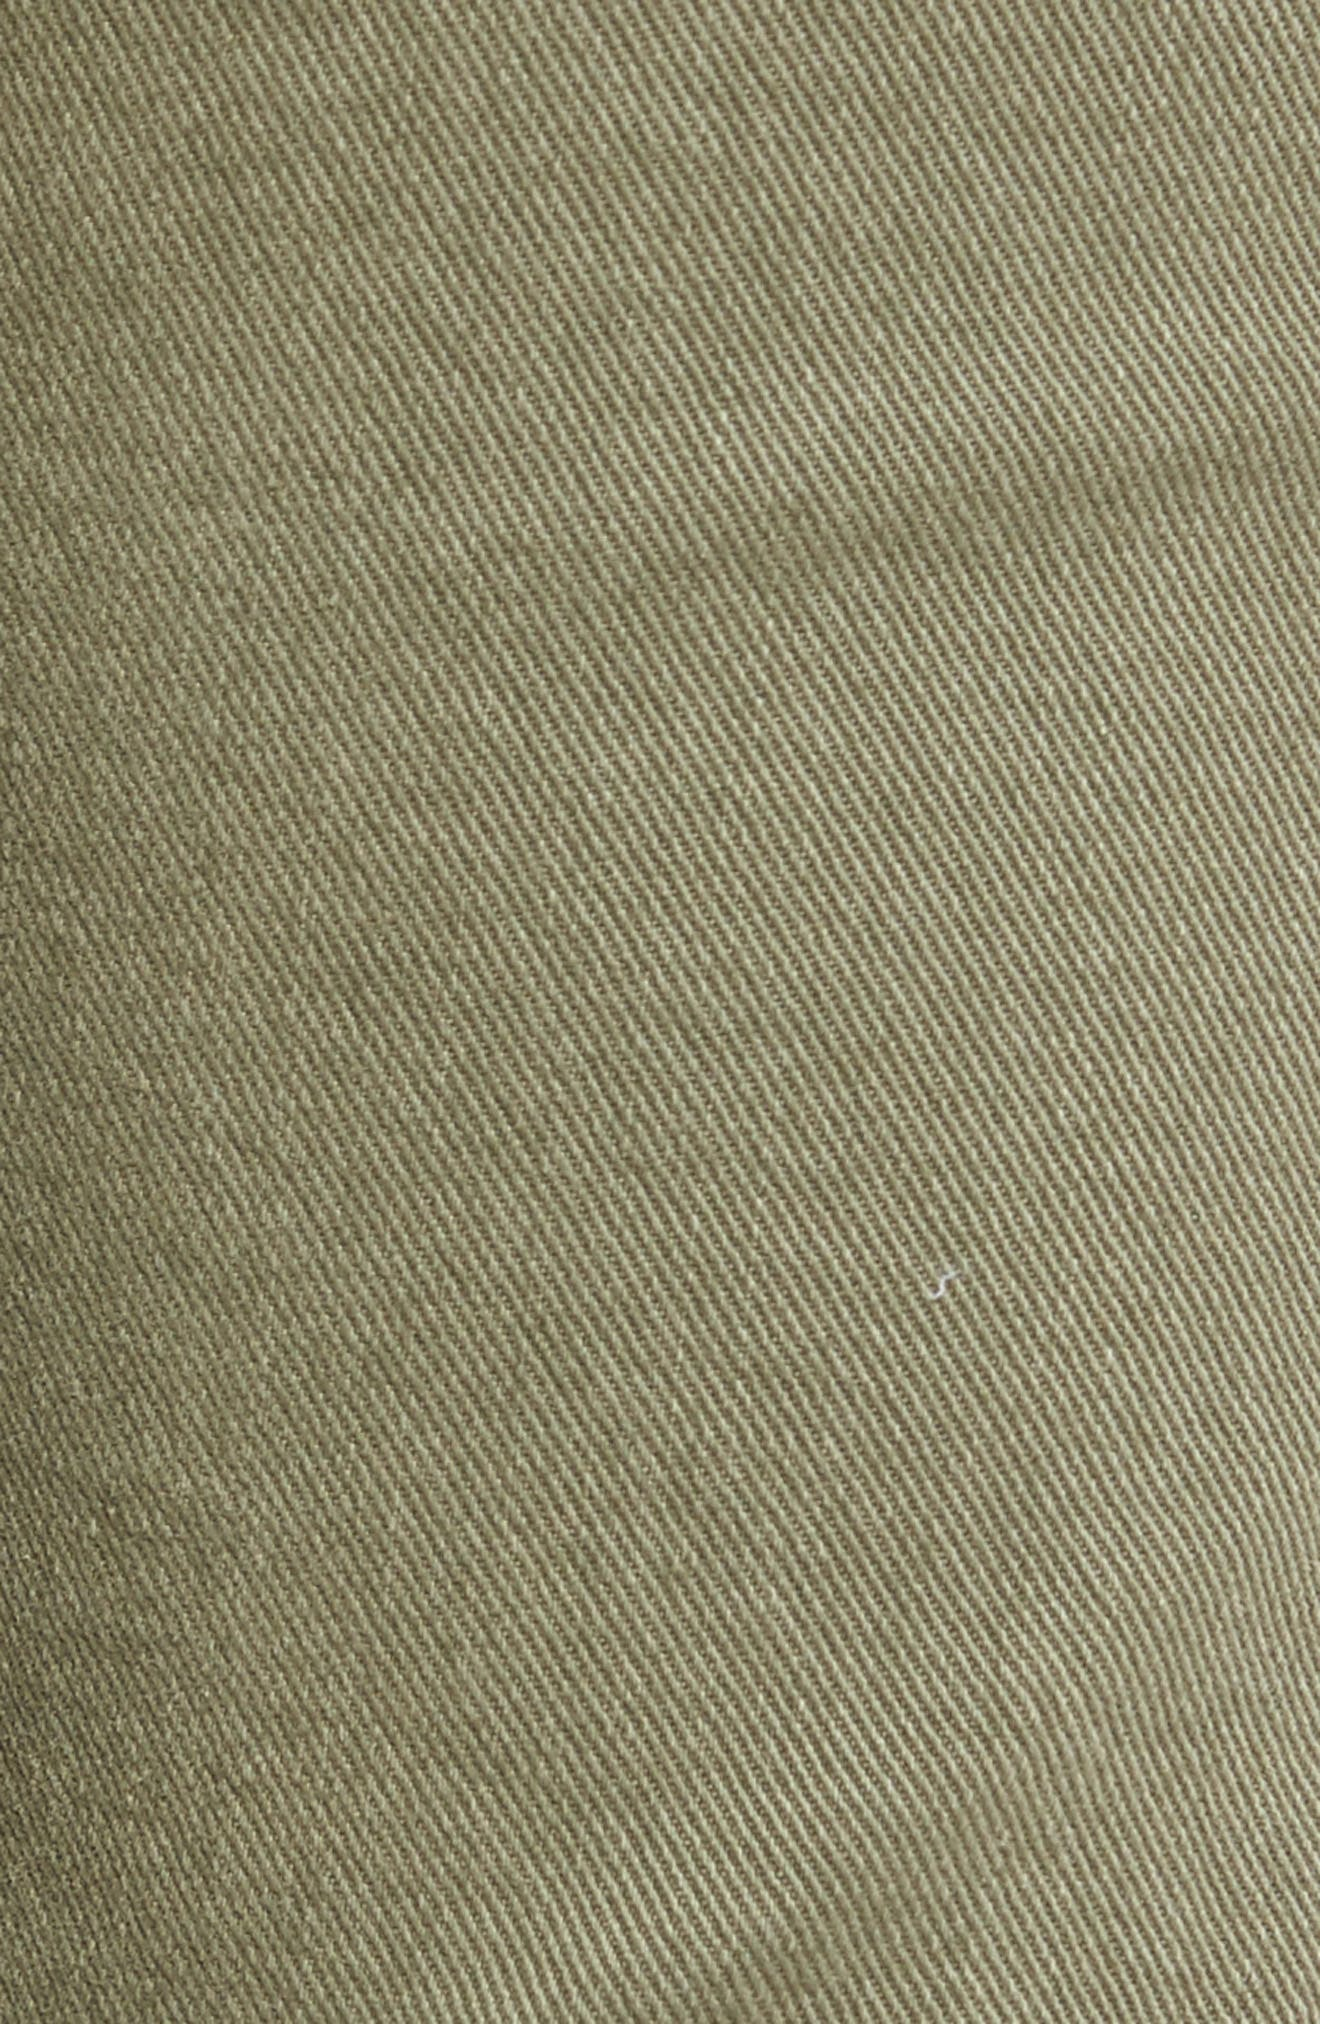 Alternate Image 5  - 7 For All Mankind® Josefina Destroyed Boyfriend Jeans (Sun Bleached Olive)